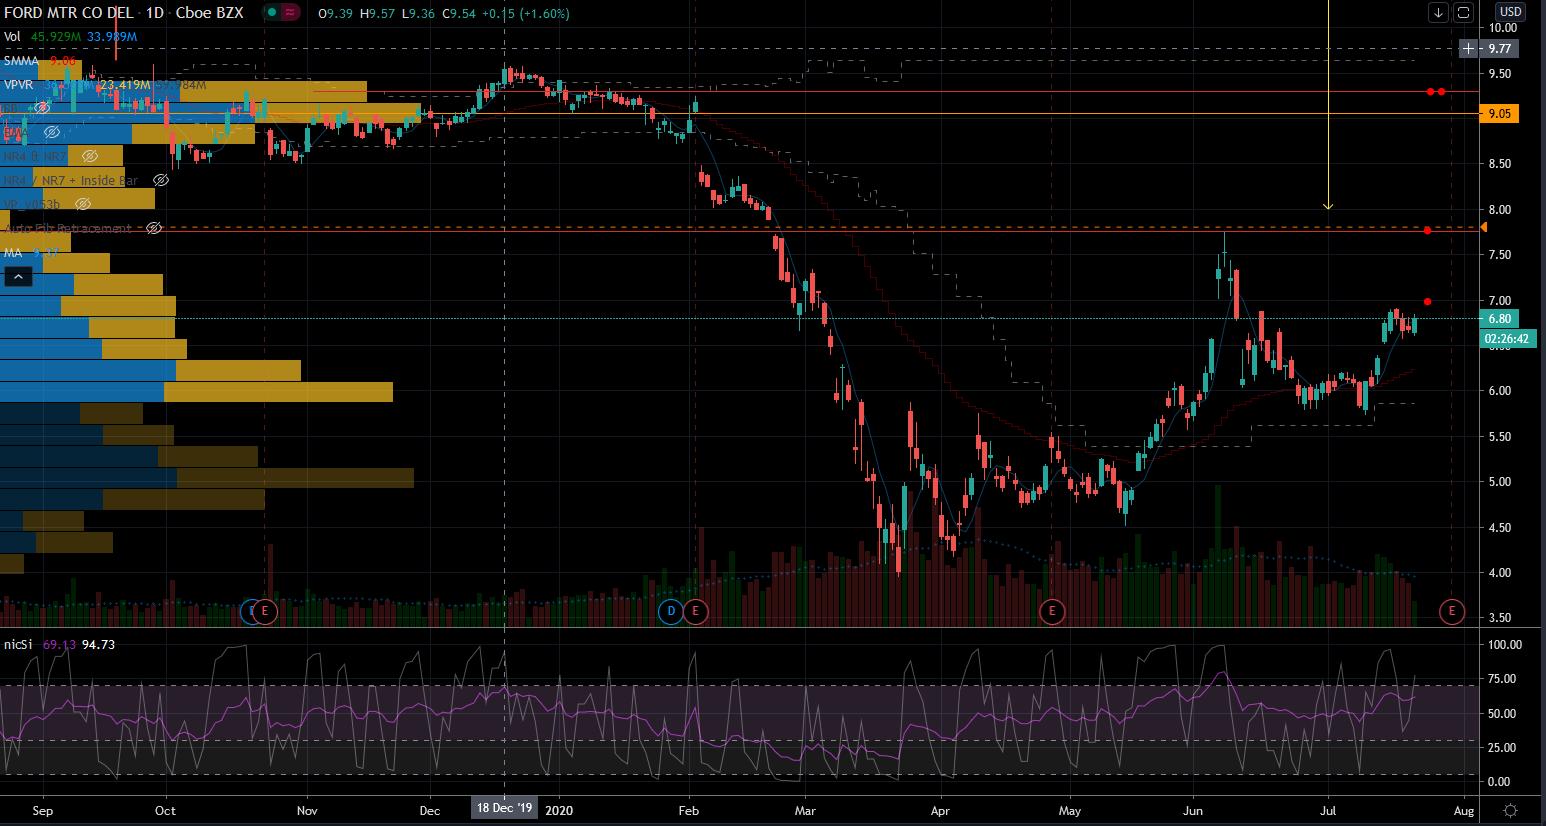 Robinhood Stocks: Ford (F) Stock Chart Showing Upside Triggers